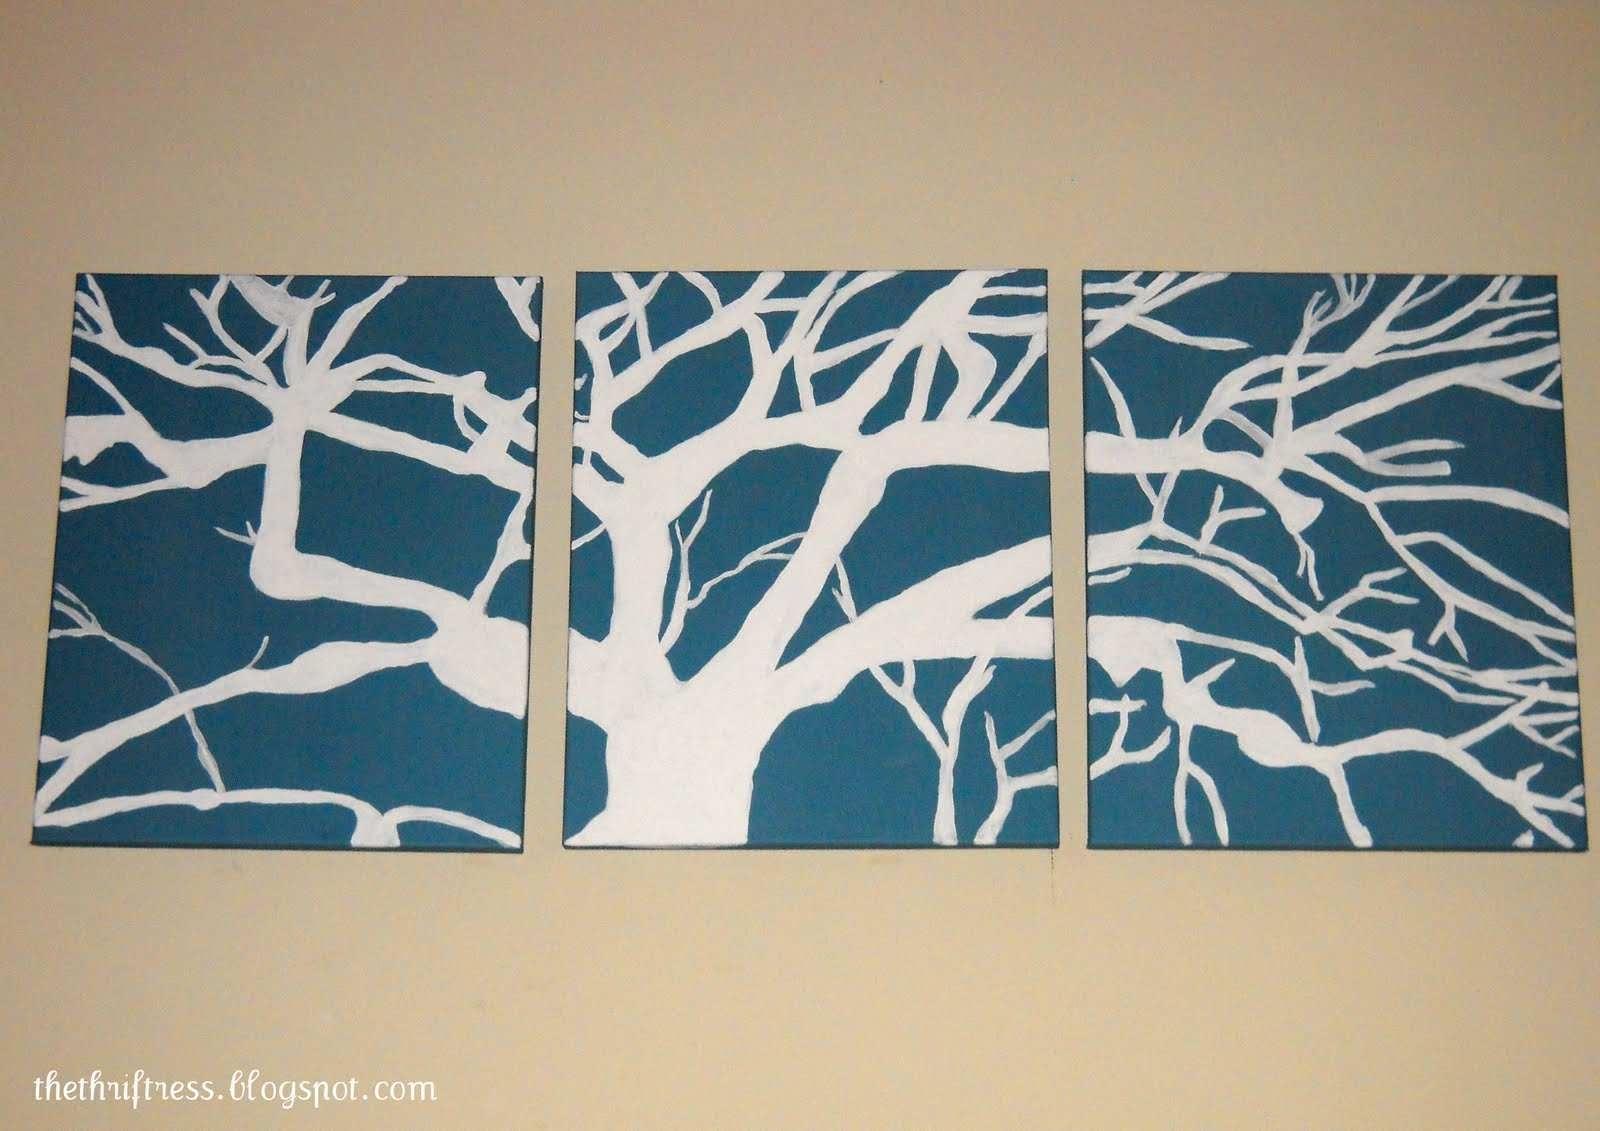 Wall Art Canvas Painting Fresh Diy Canvas Wall Art Vertical Home With Diy Canvas Wall Art (Photo 11 of 20)